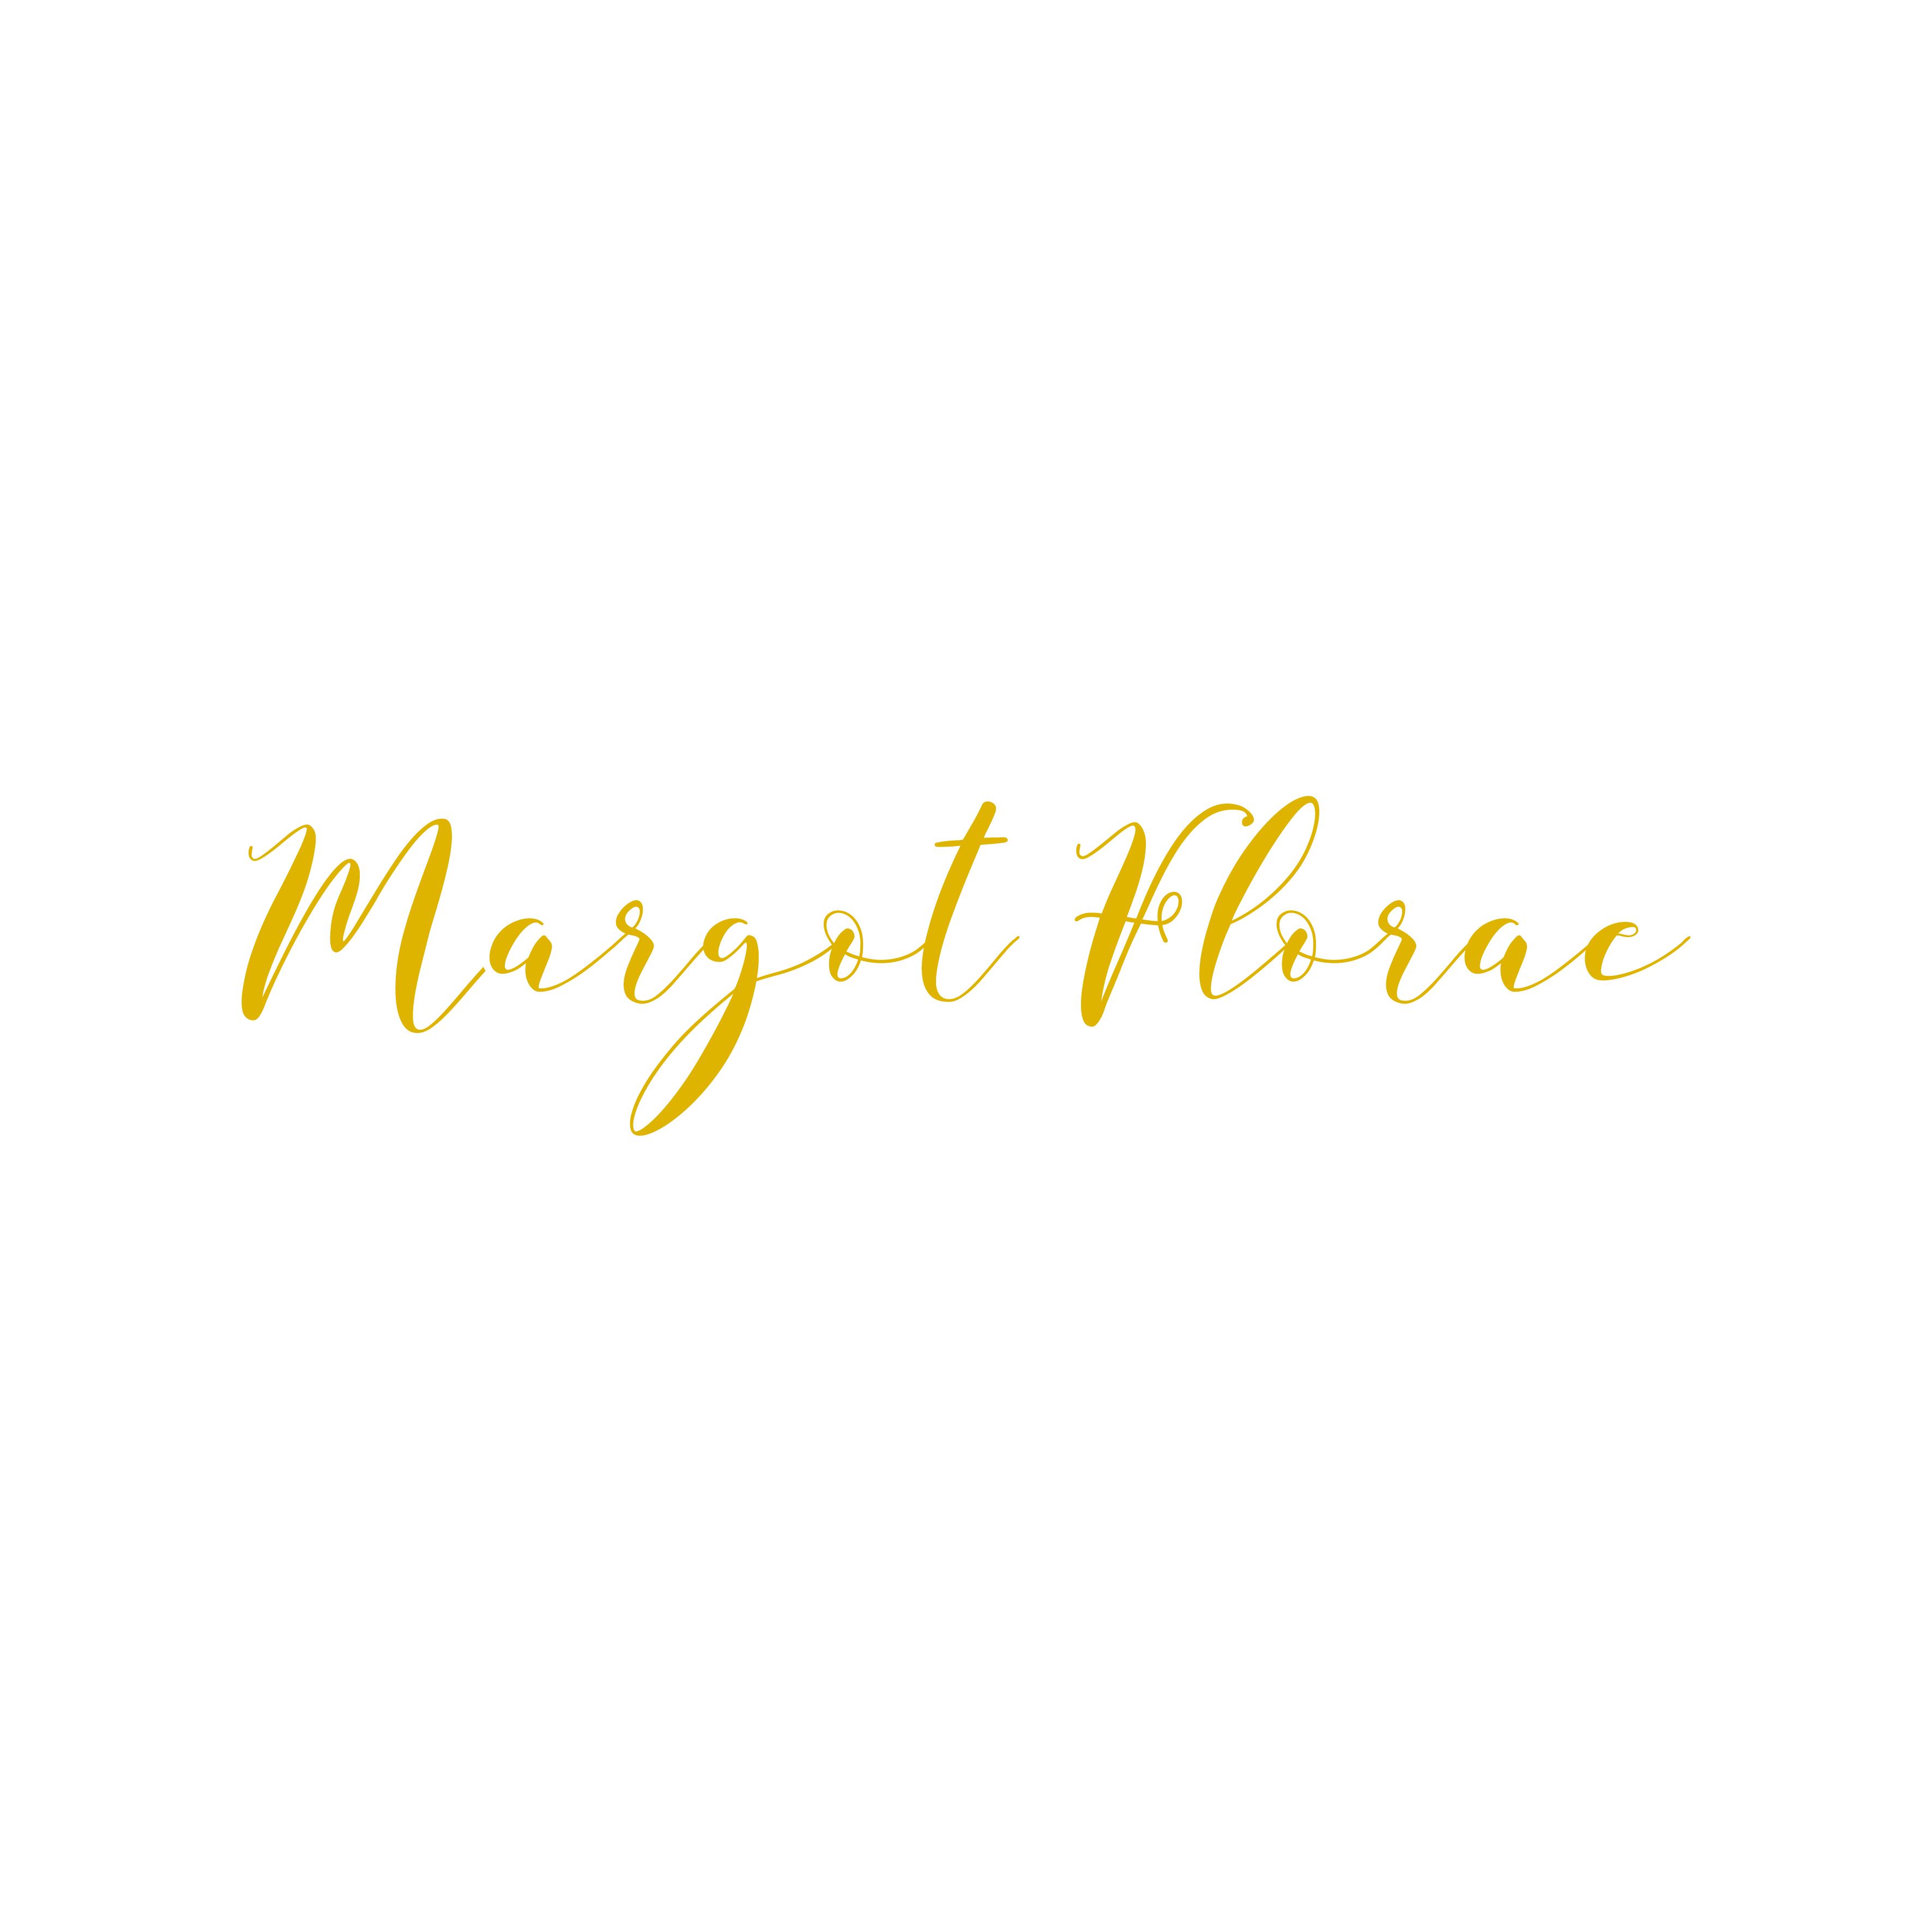 Margot Florae